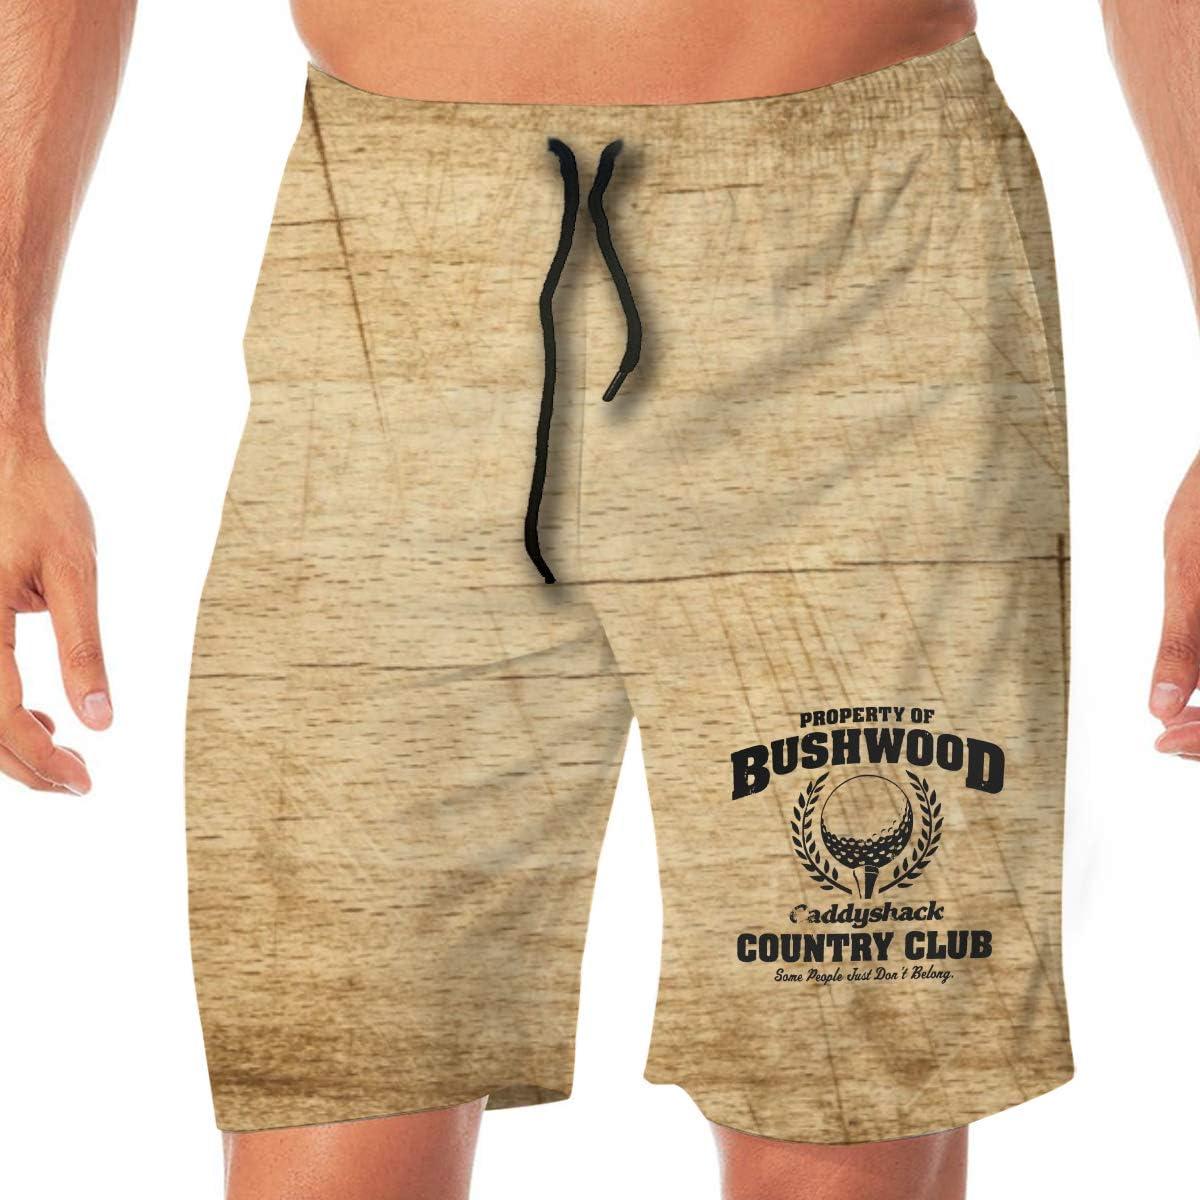 Bushwood Country Club Mens Classic Swim Beach Shorts with Pockets